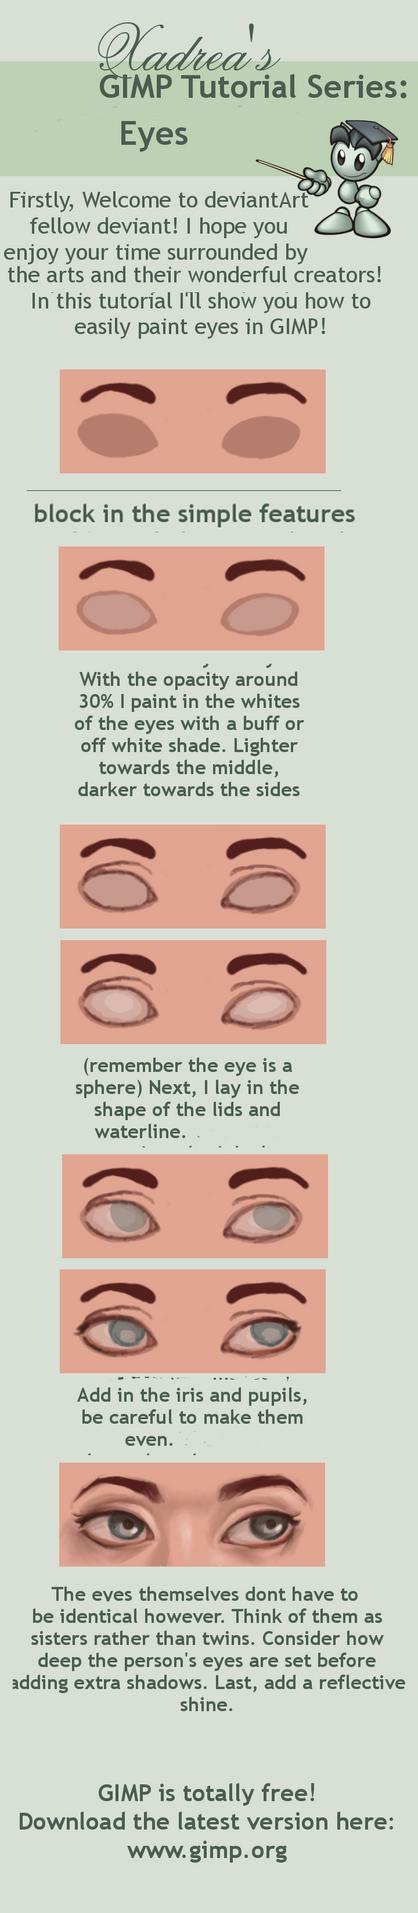 GIMP Tutorial: Eyes by Xadrea